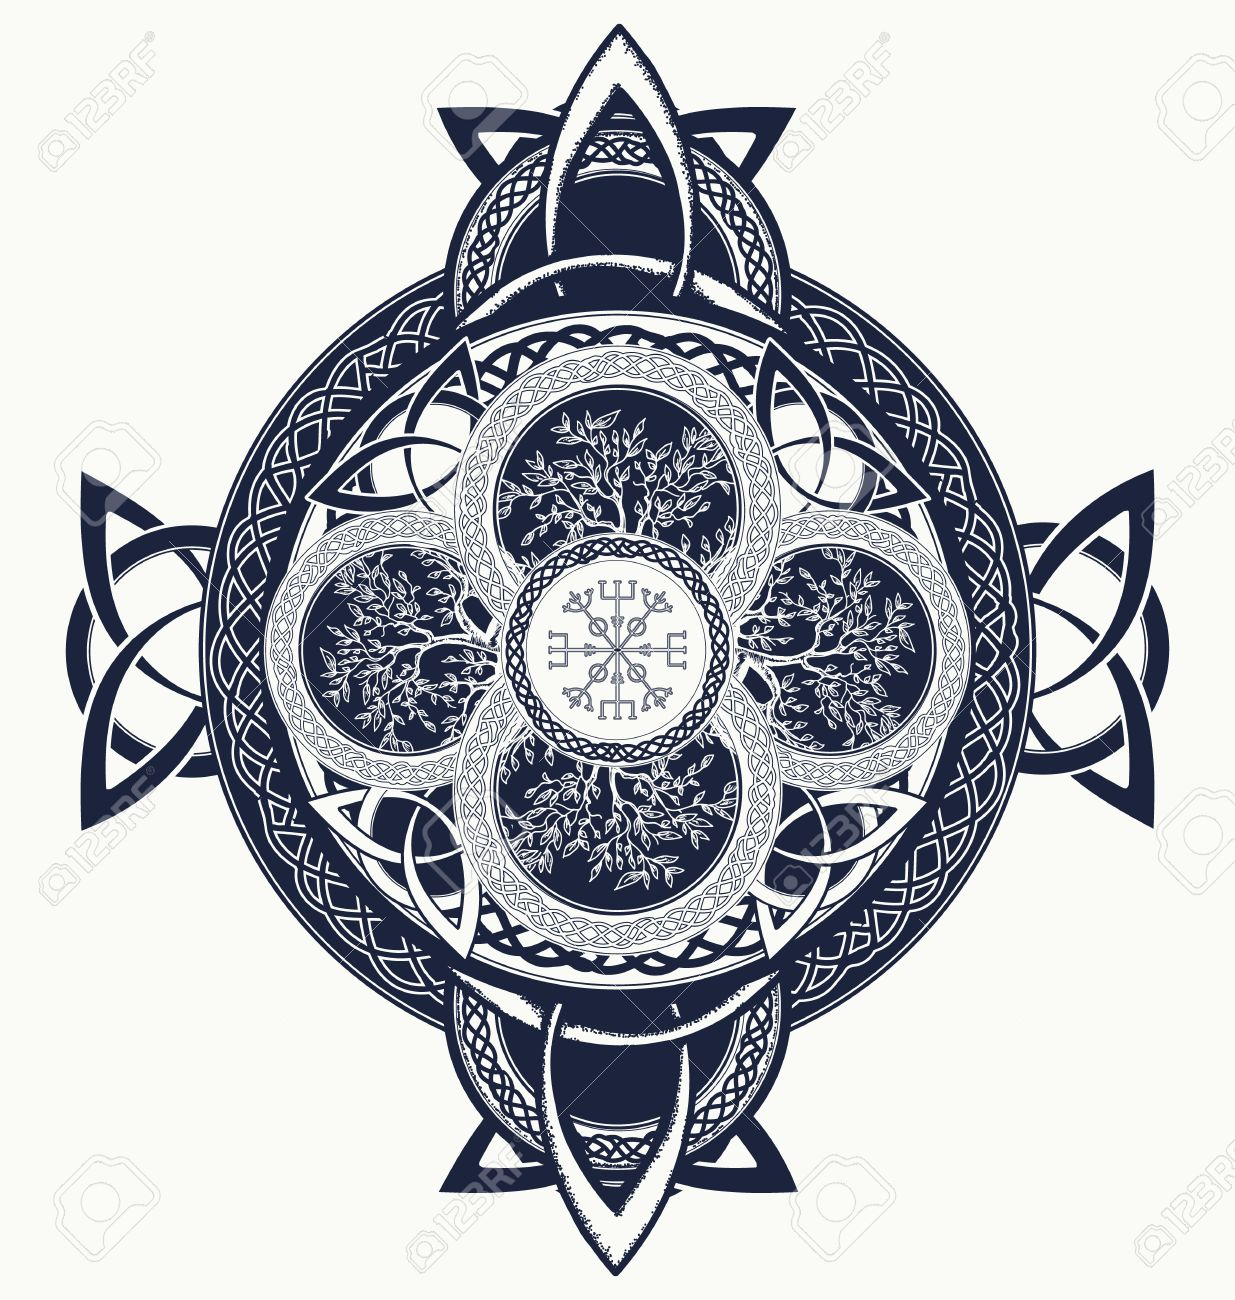 Celtic Cross Tattoo Dragons And Celtic Tree Of Life Mystic